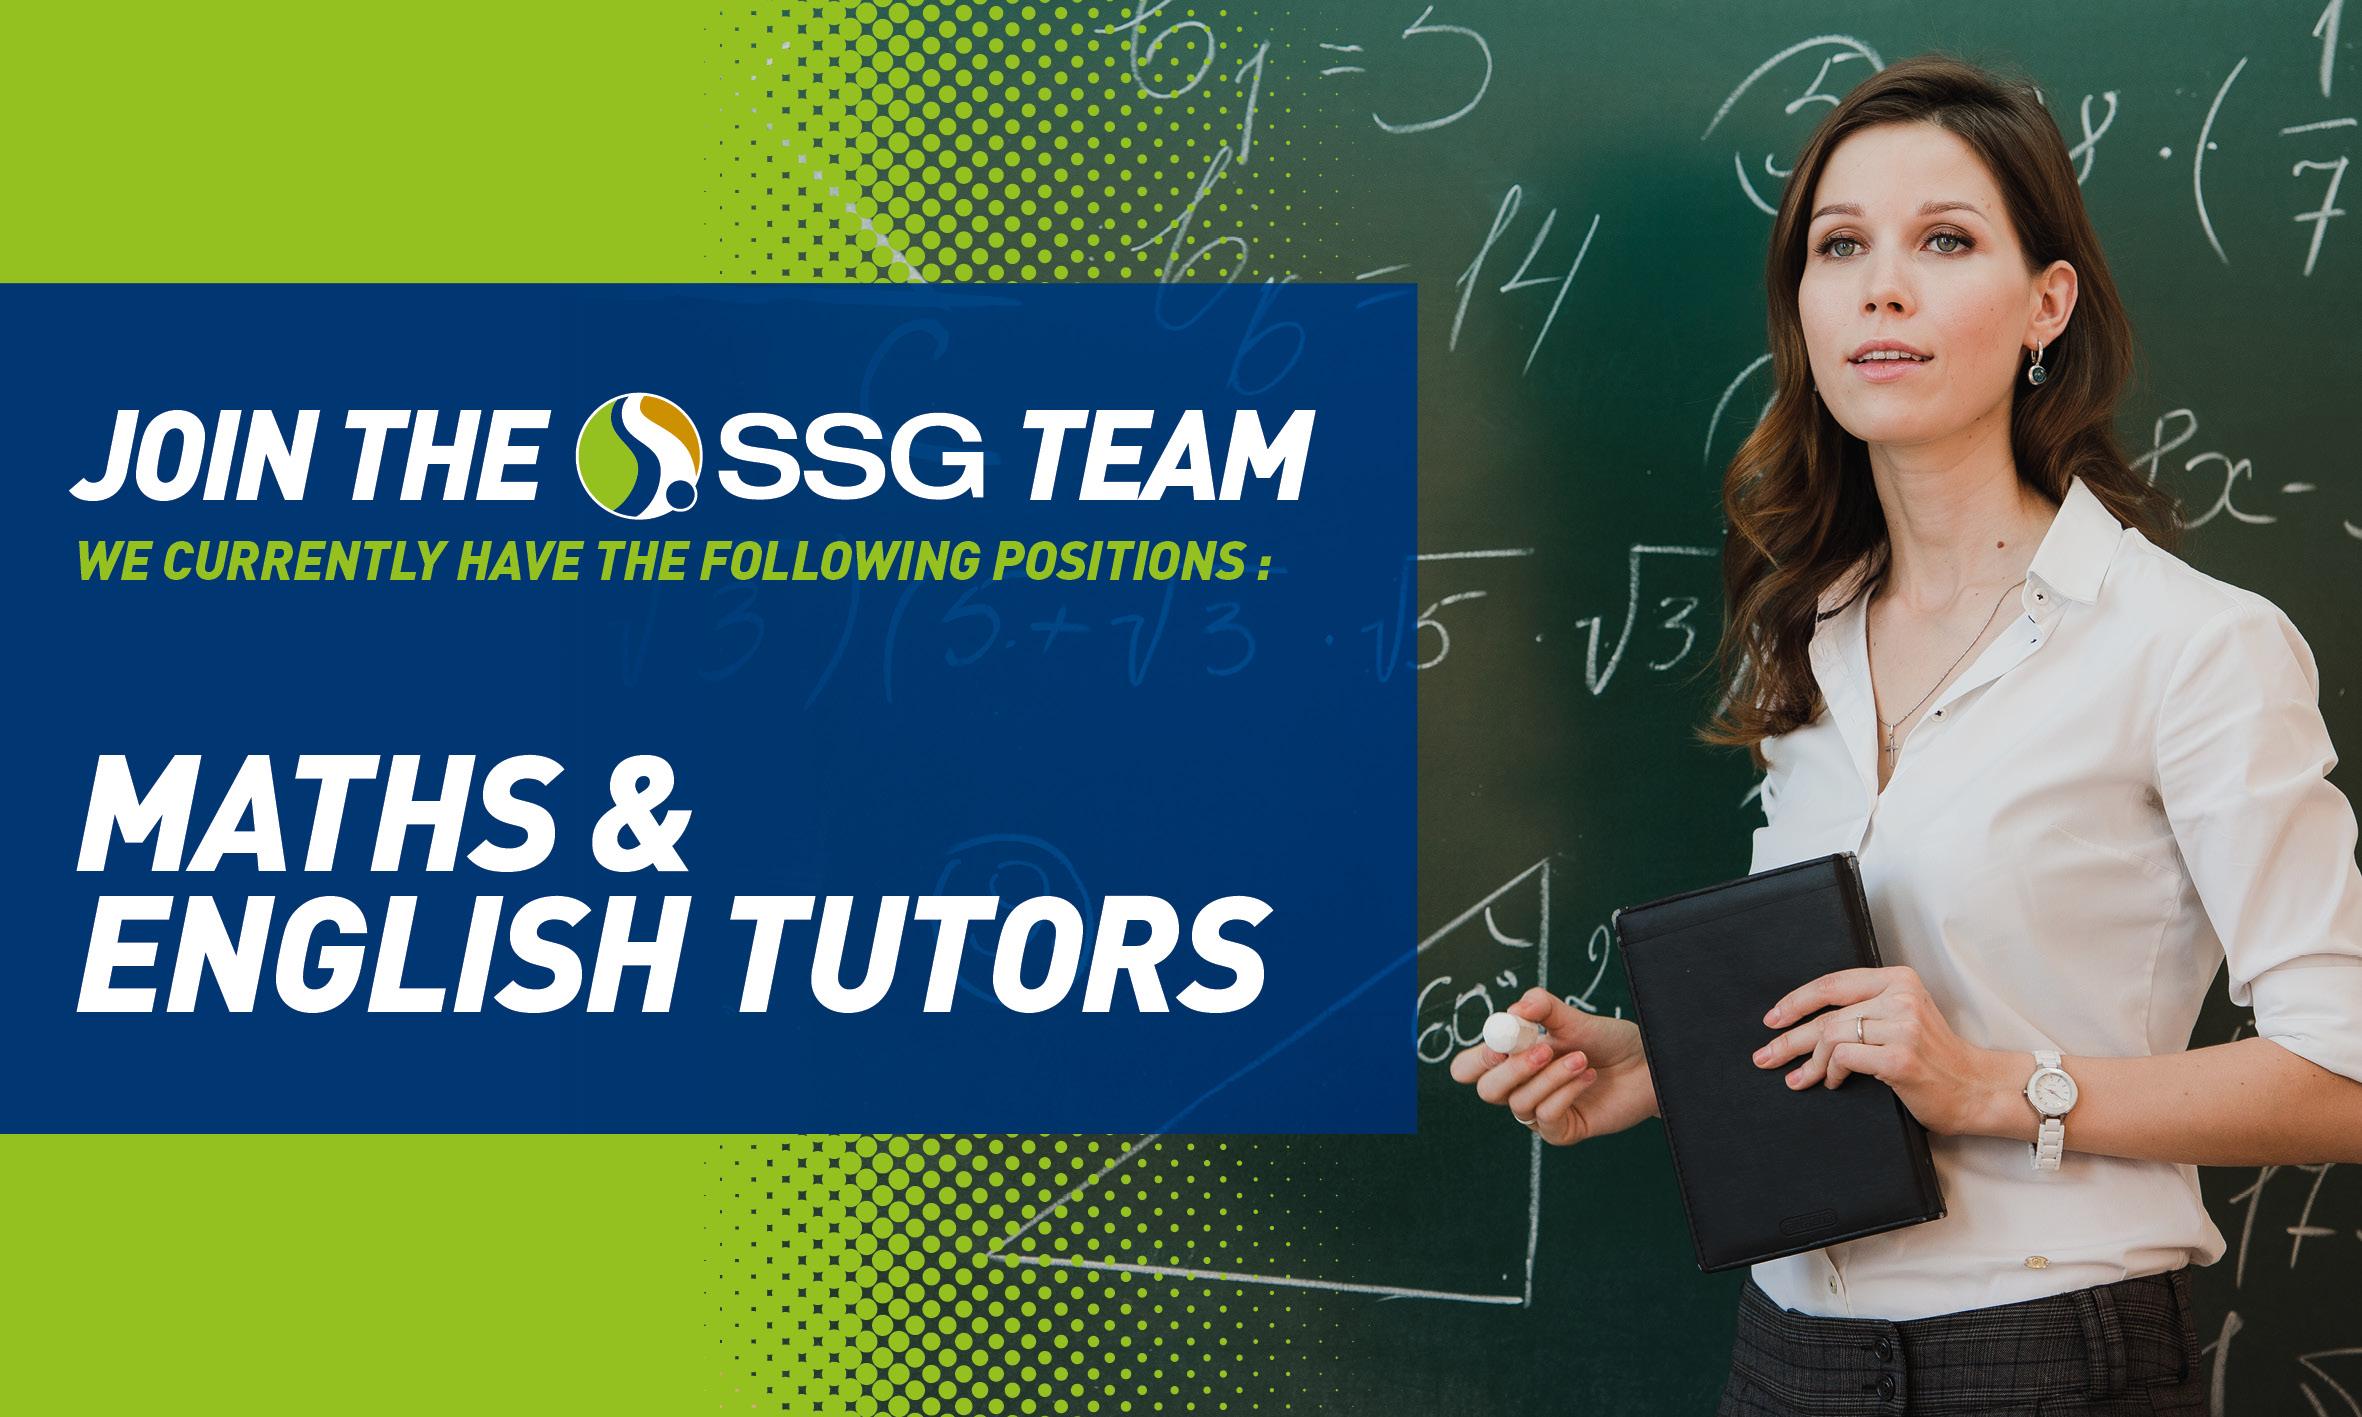 SSG_Job_FB5